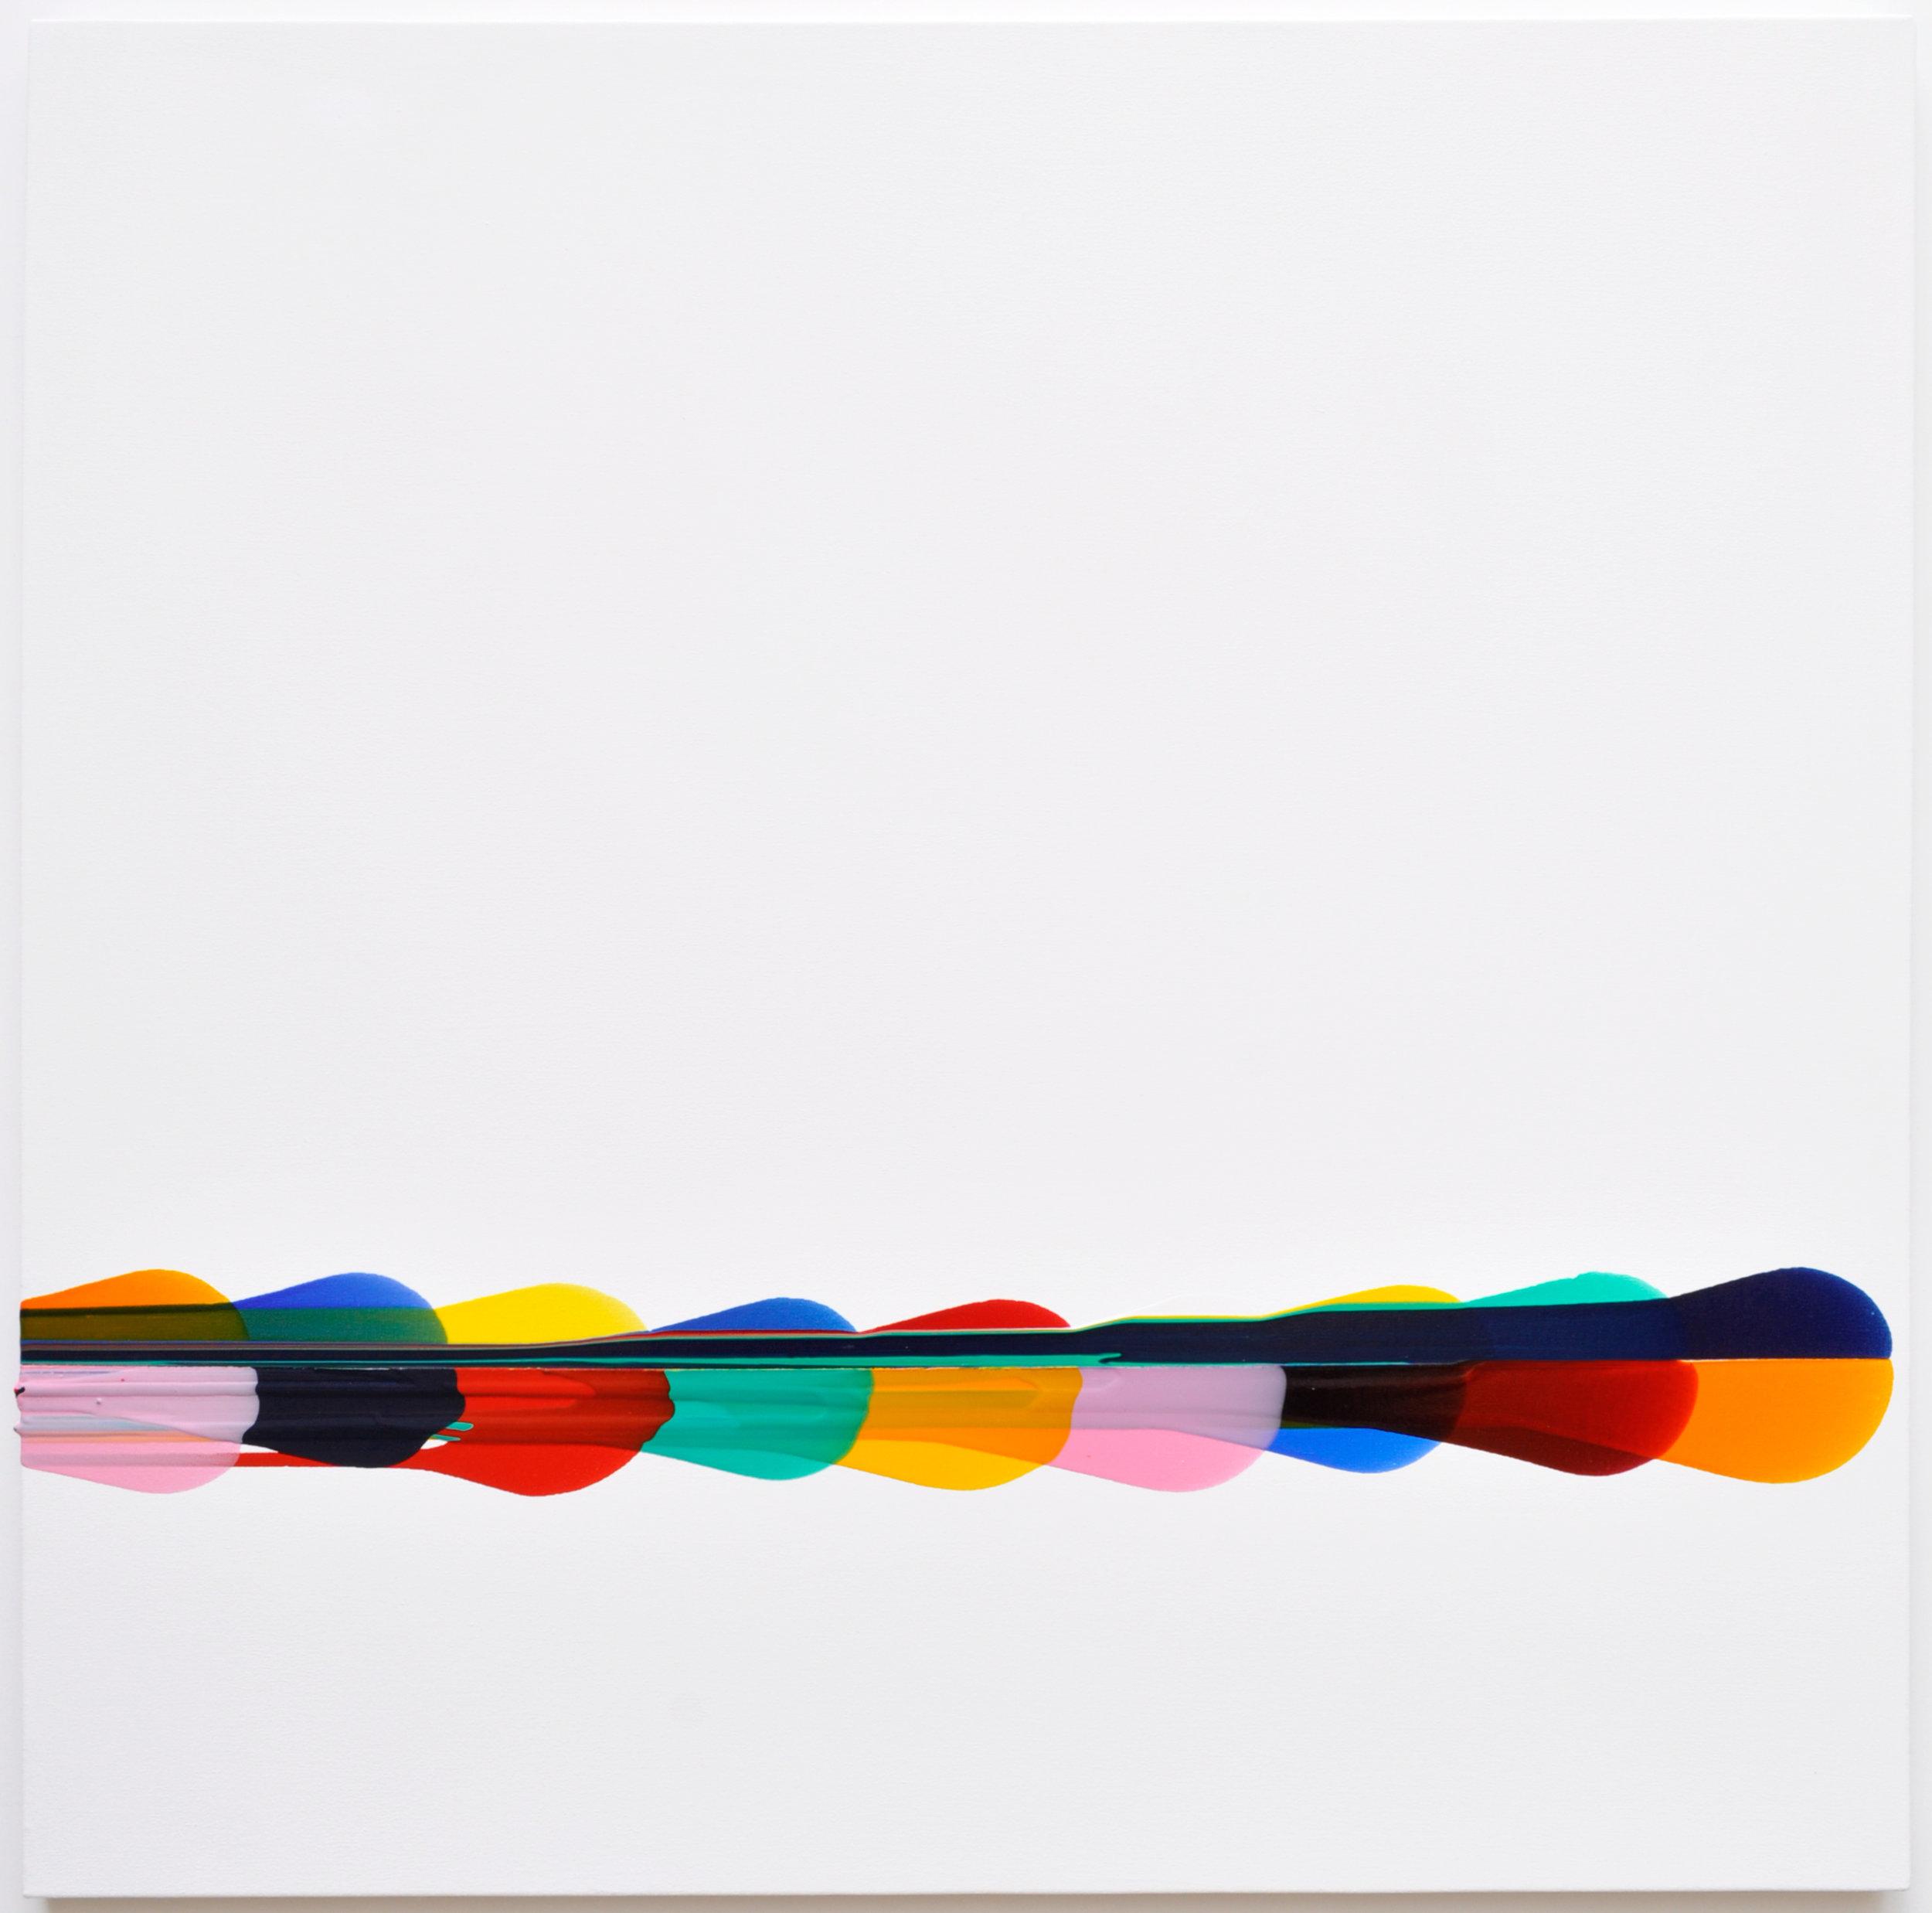 Sarah Porter, Monte Carlo, Acrylic on canvas, 90cm x 90cm x 1cm,  http://www.sarahemilyporter.com